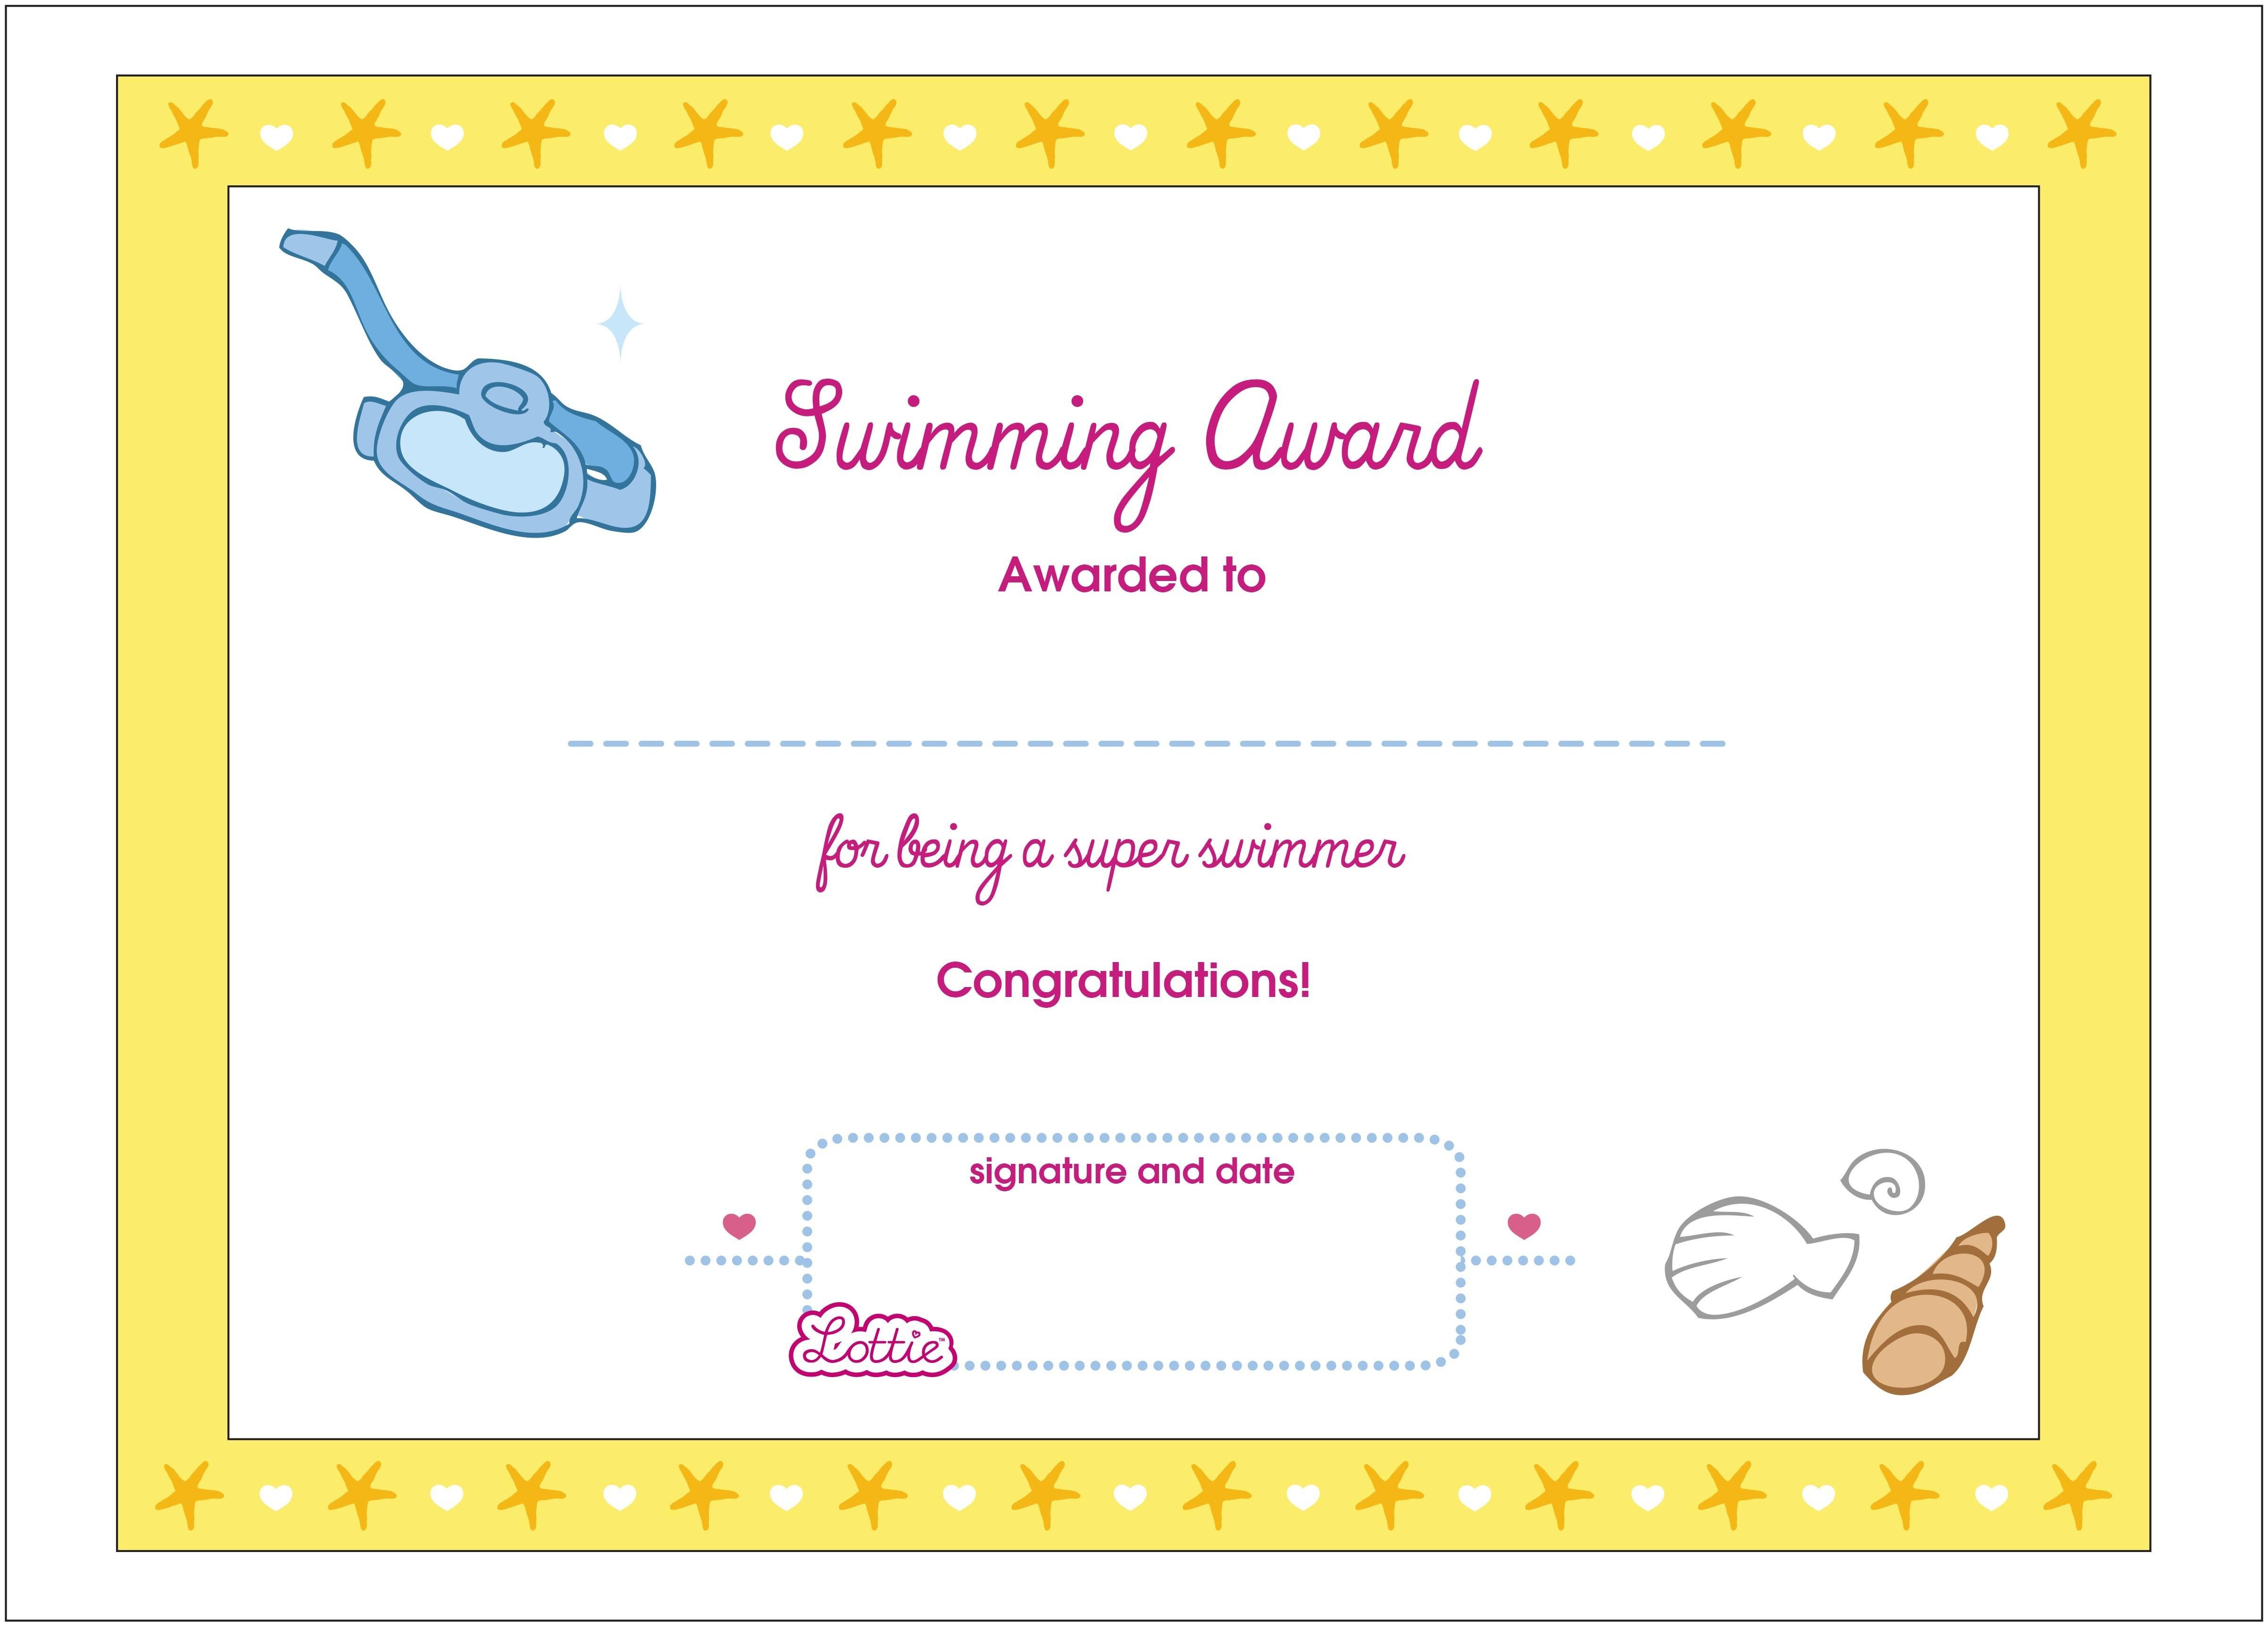 Swimming Printable Award Certificate – Lottie Dolls - Free Printable Swimming Certificates For Kids